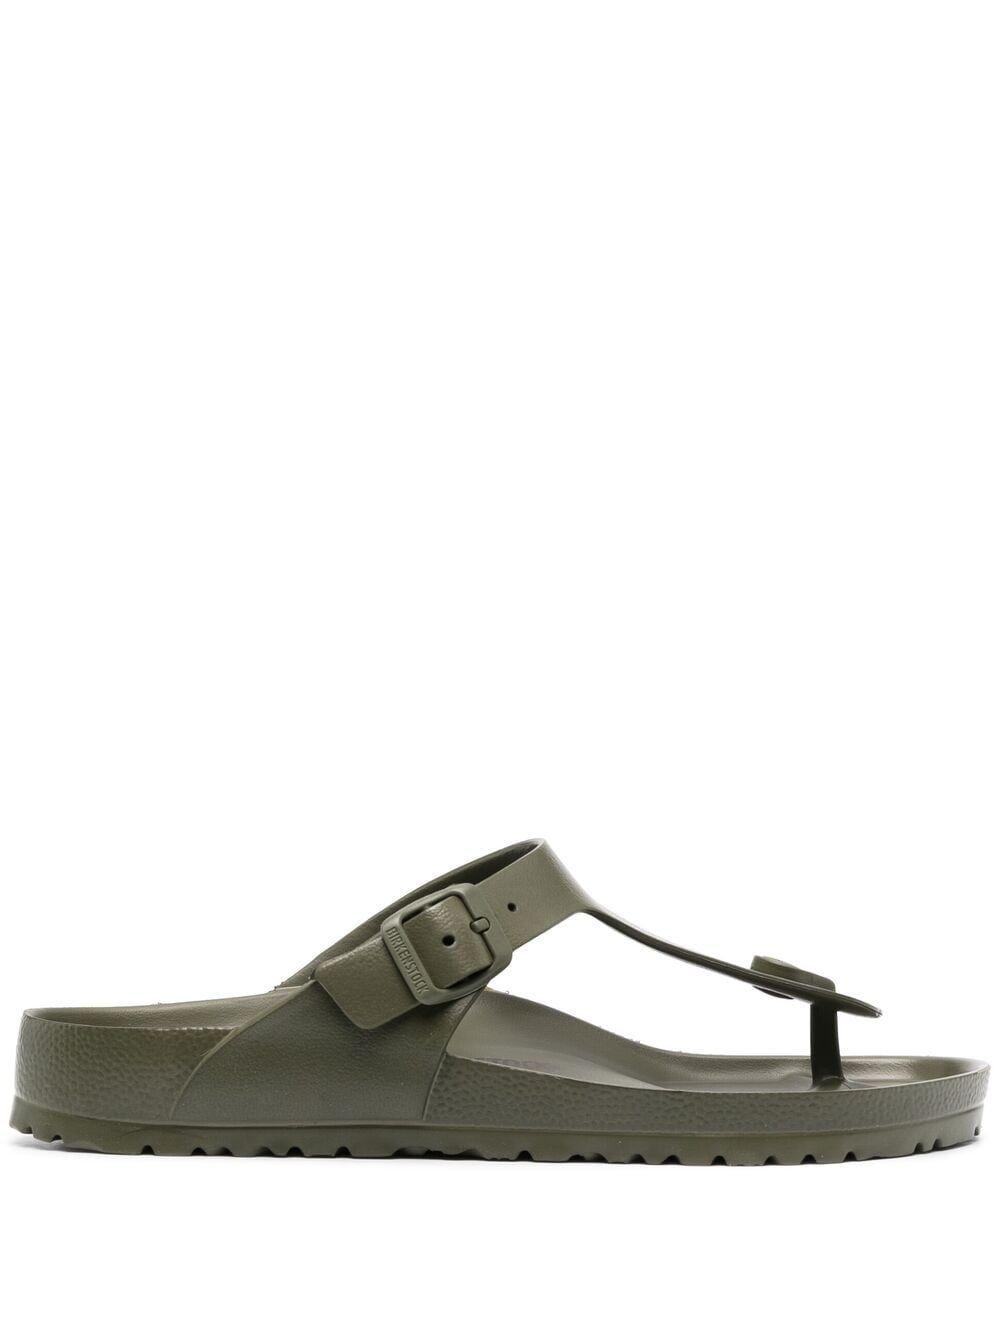 Sandalo gizeh eva